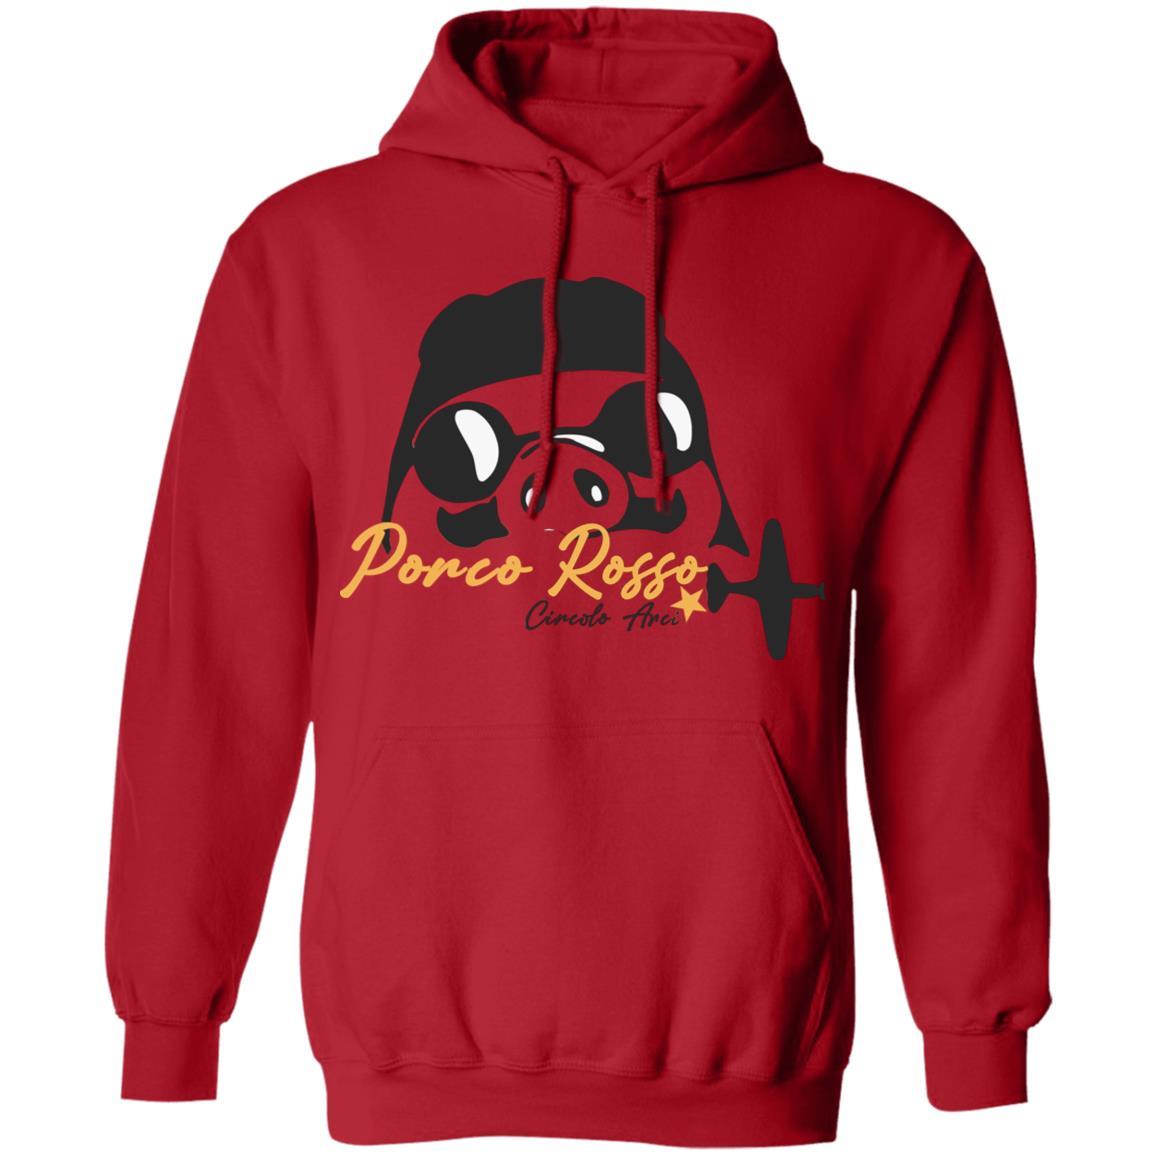 Porco Rosso Logo Hoodie Unisex